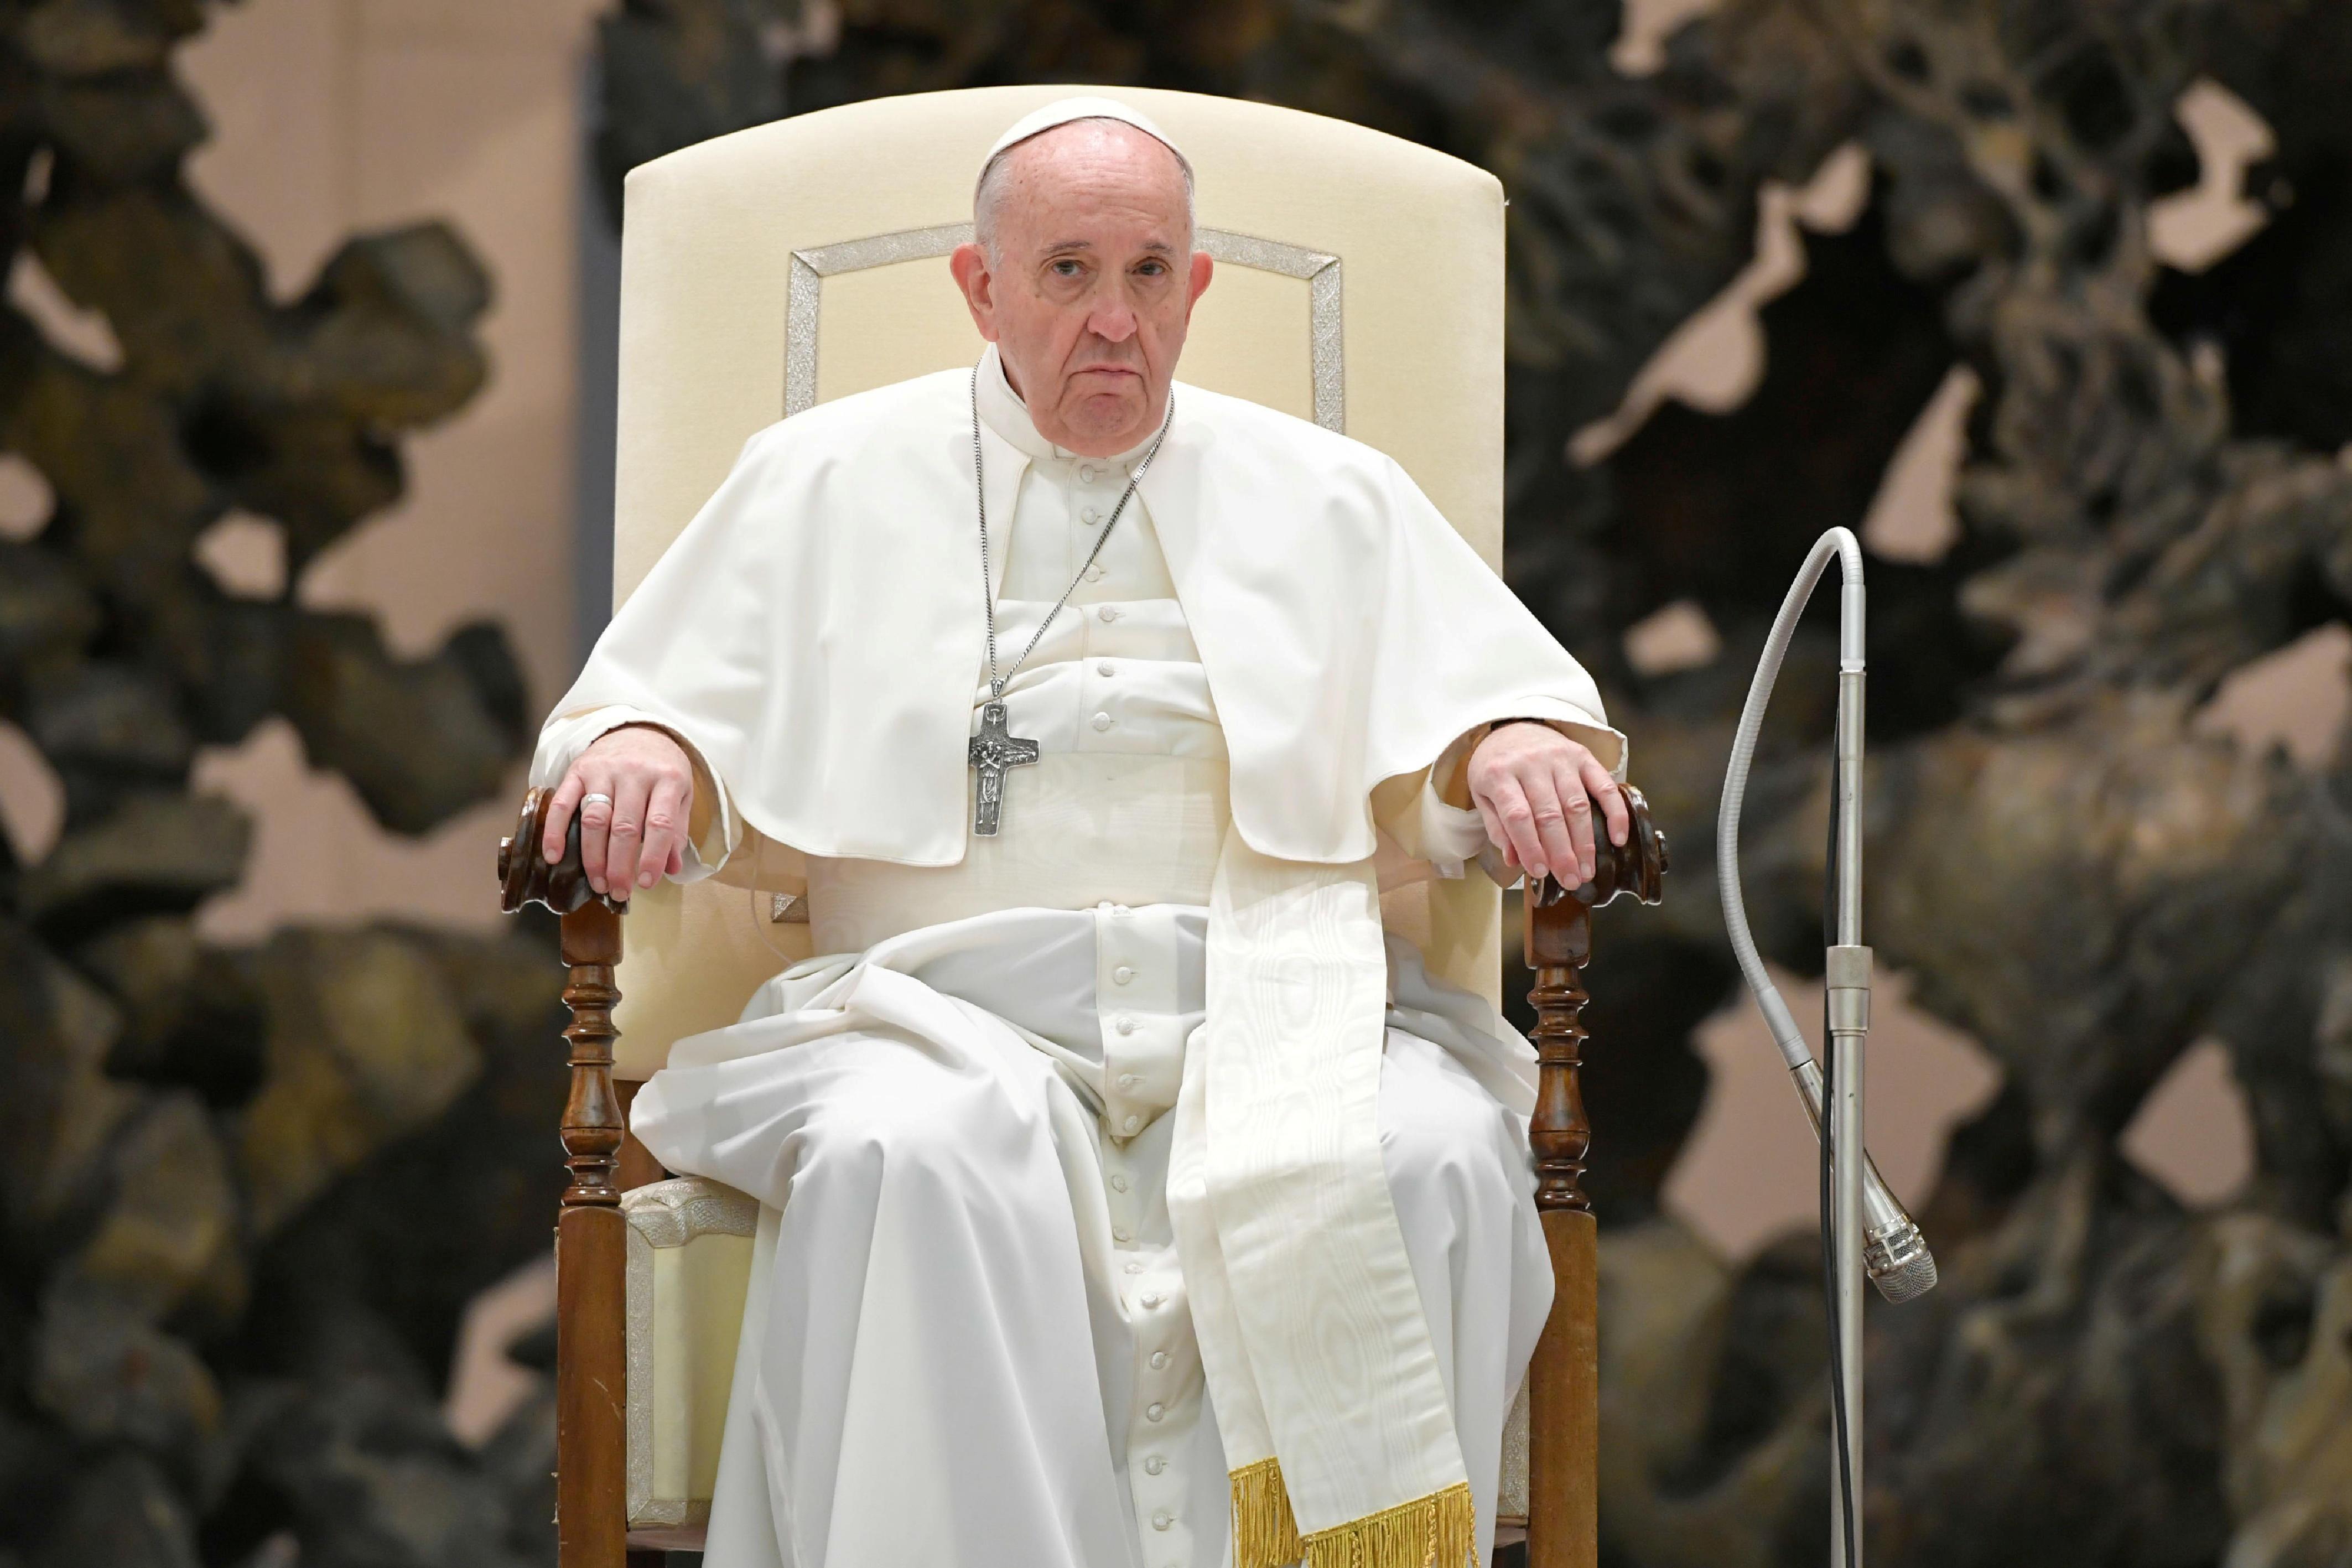 Vatican condemns Nice church attack, says terror never acceptable